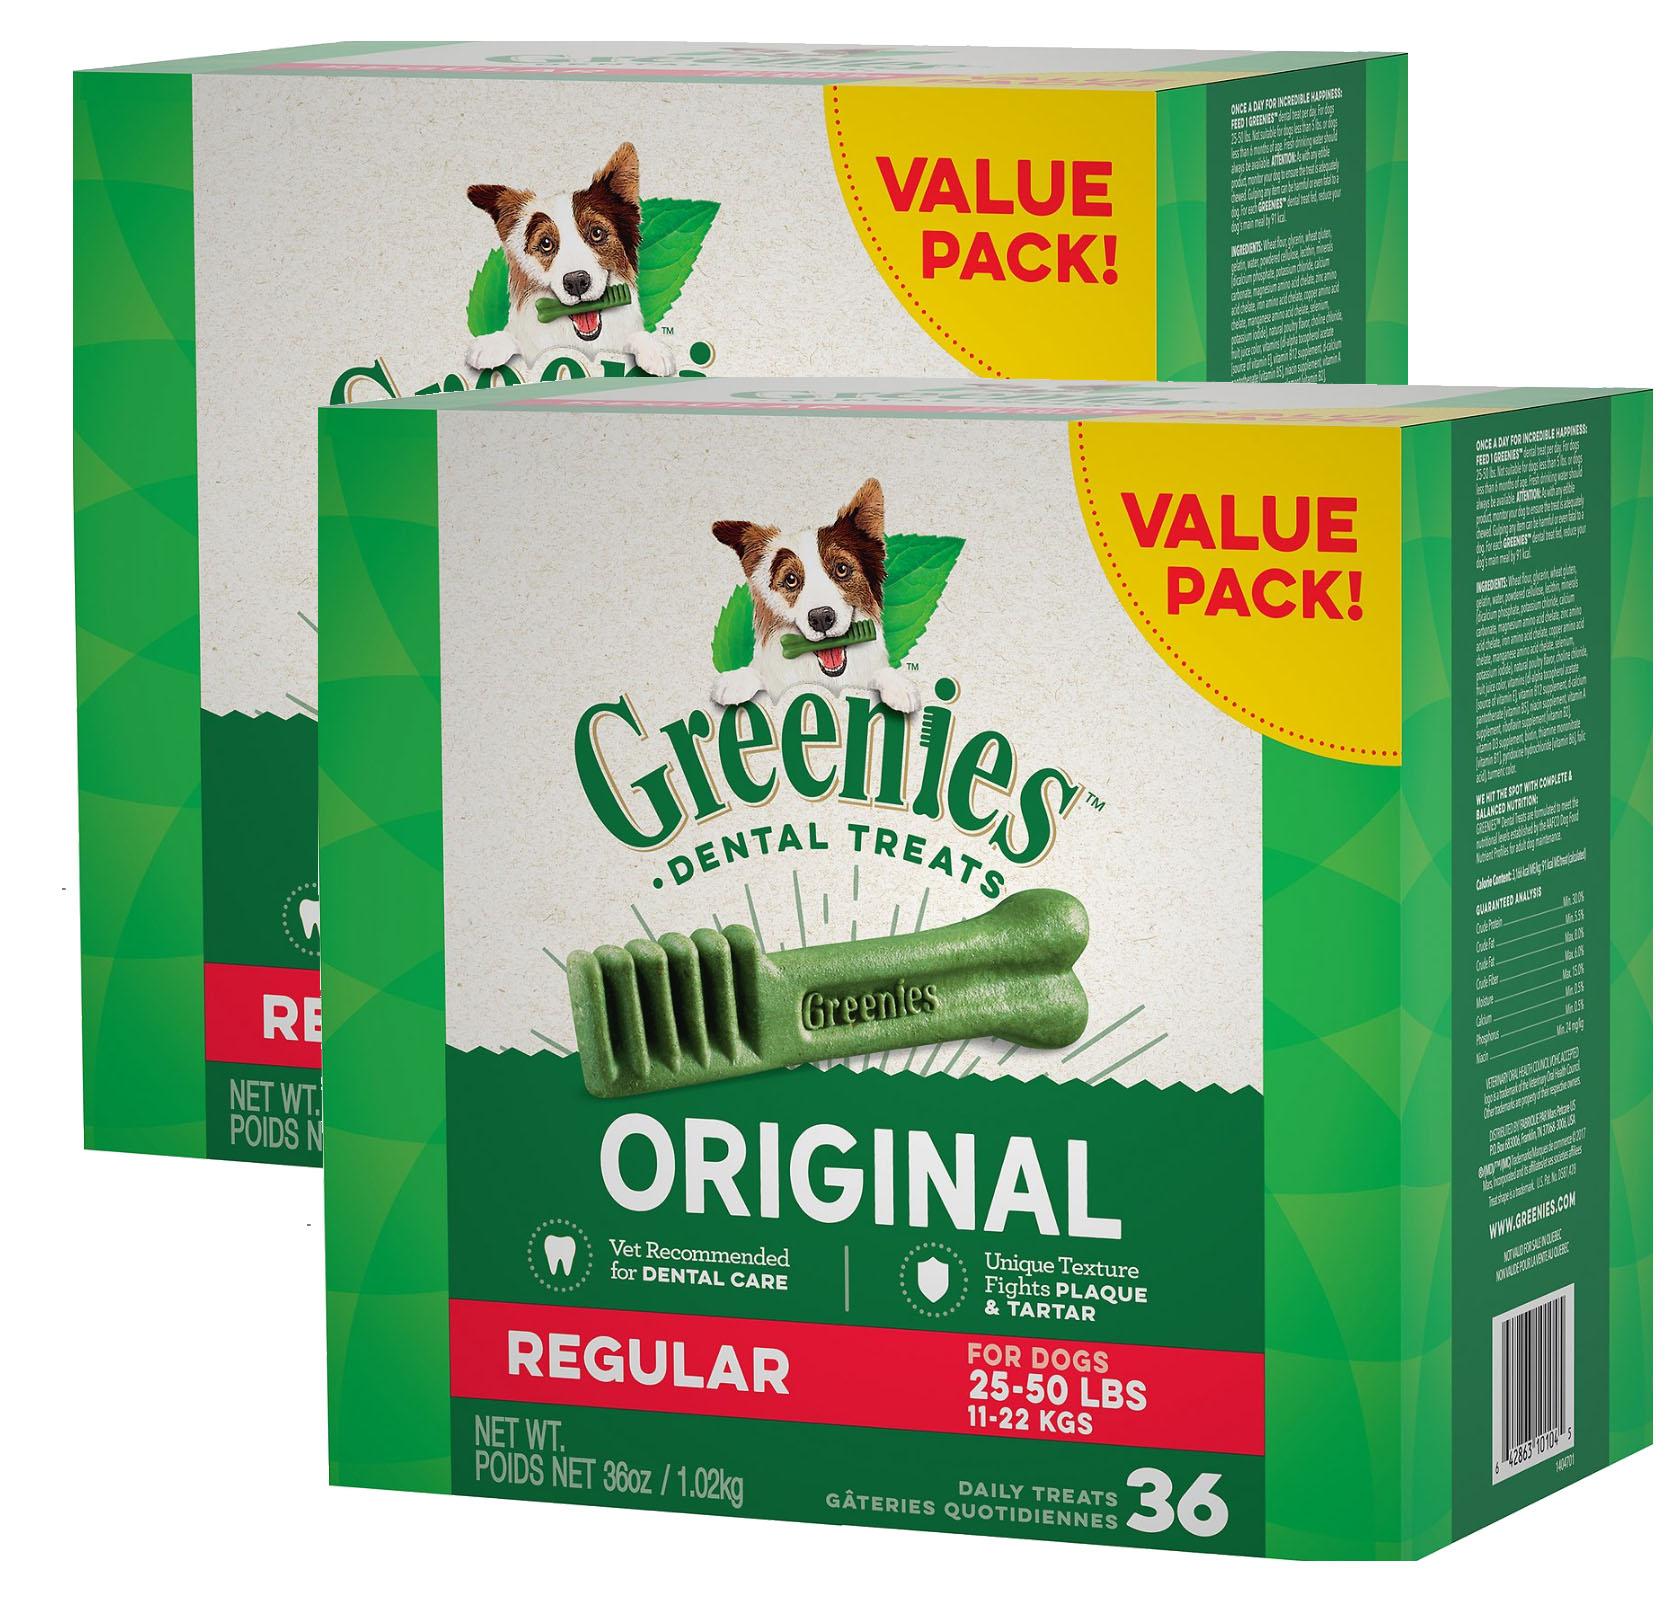 New Chewy Autoship Customers: 72-Count Greenies Regular Dental Dog Treats (dogs 25-50lbs) $23.79 ($11.89 per 36oz box)+ free shipping